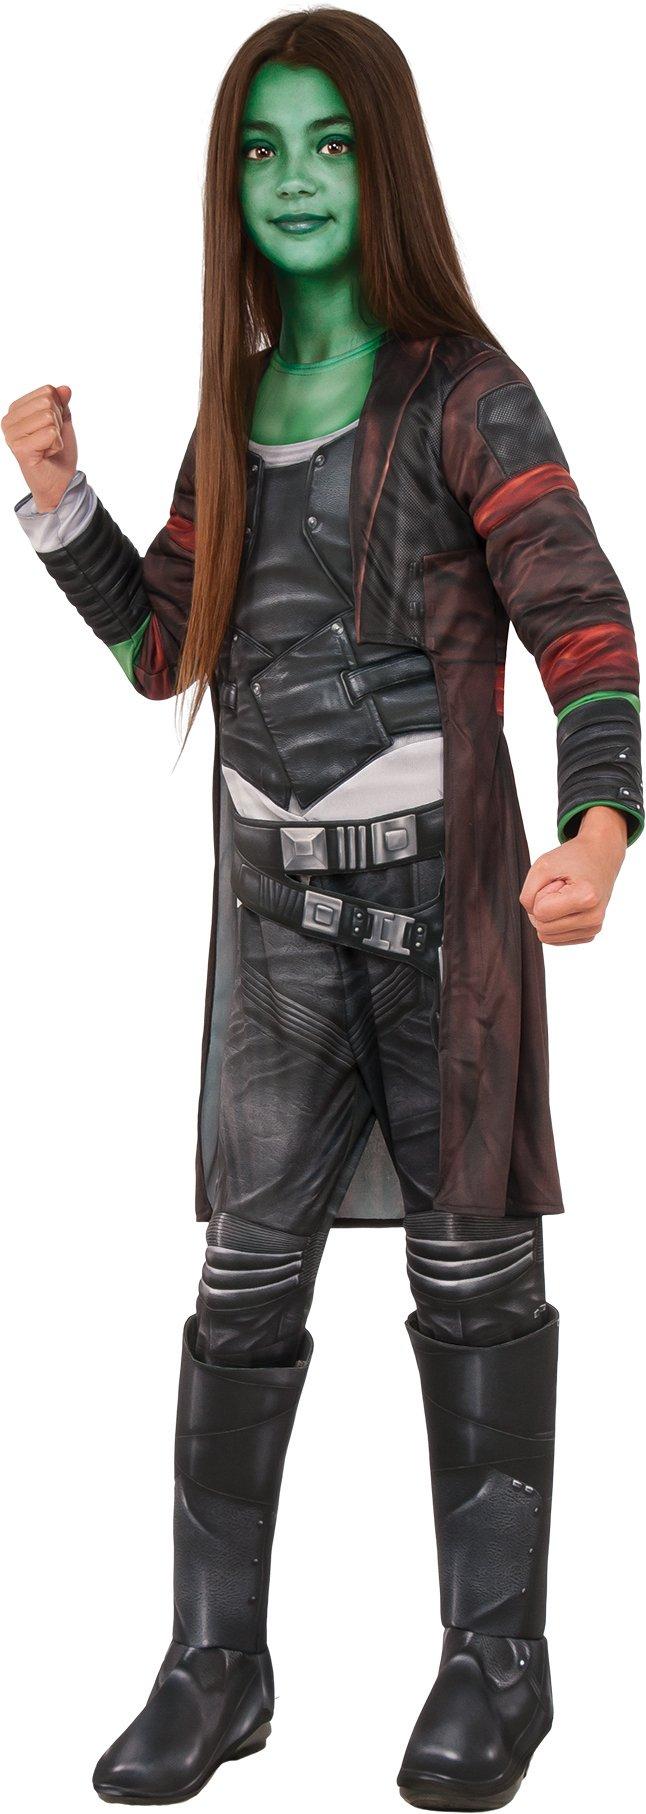 Rubie's Costume Co Guardians of the Galaxy Vol. 2 - Gamora Deluxe Children's Costume